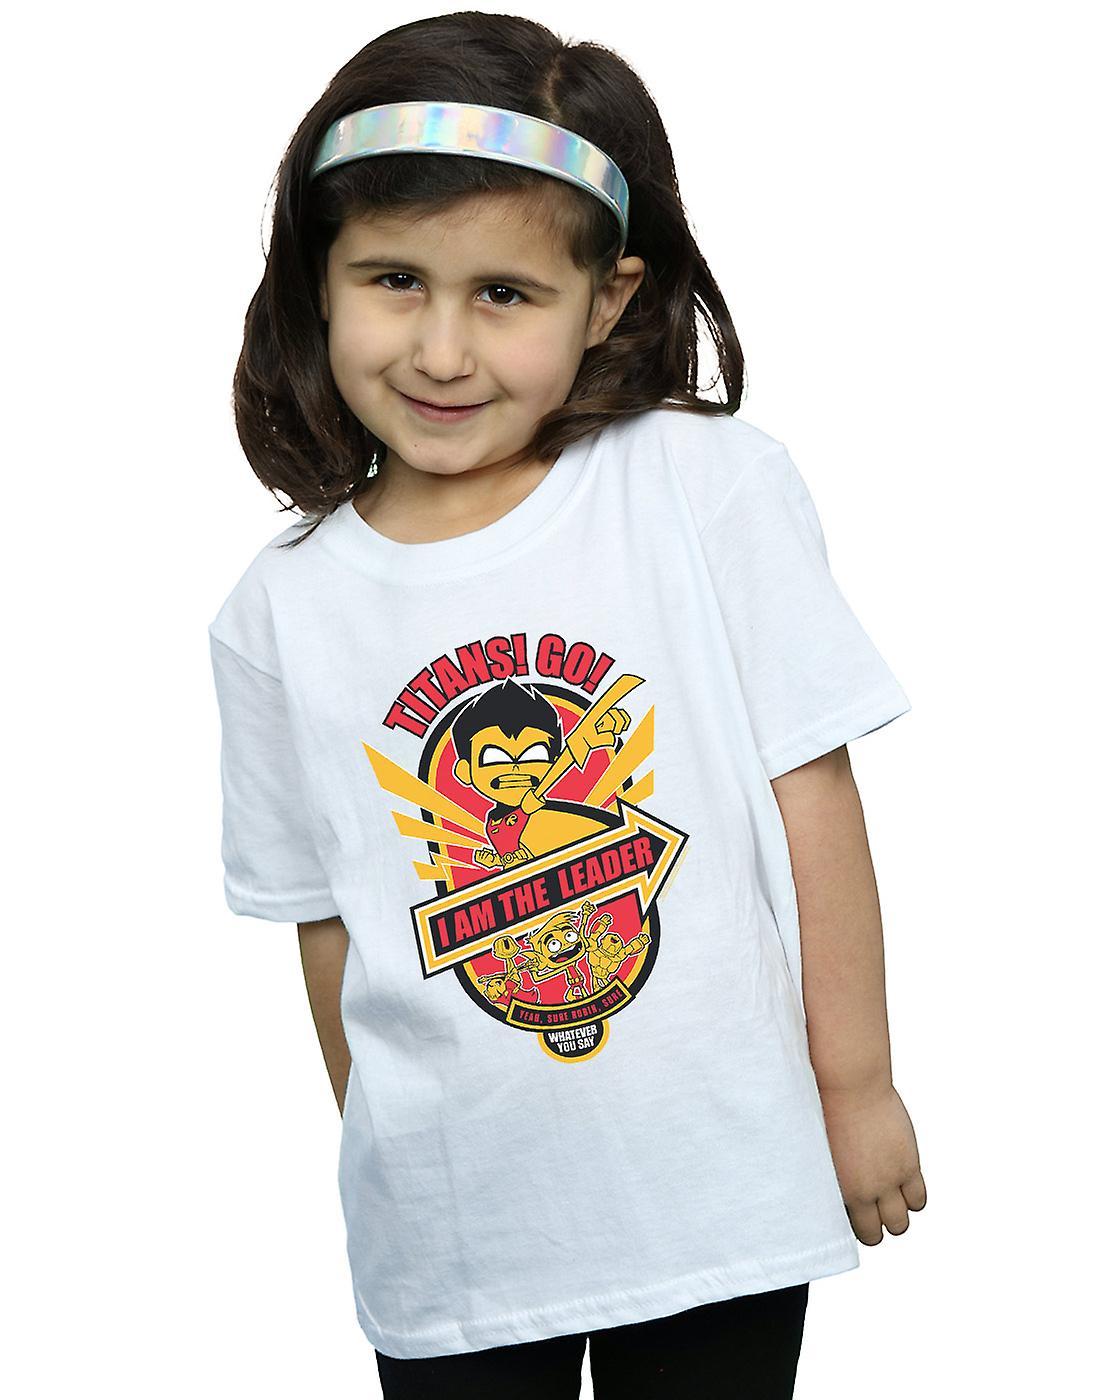 DC Comics Girls Teen Titans Go I Am The Leader T-Shirt